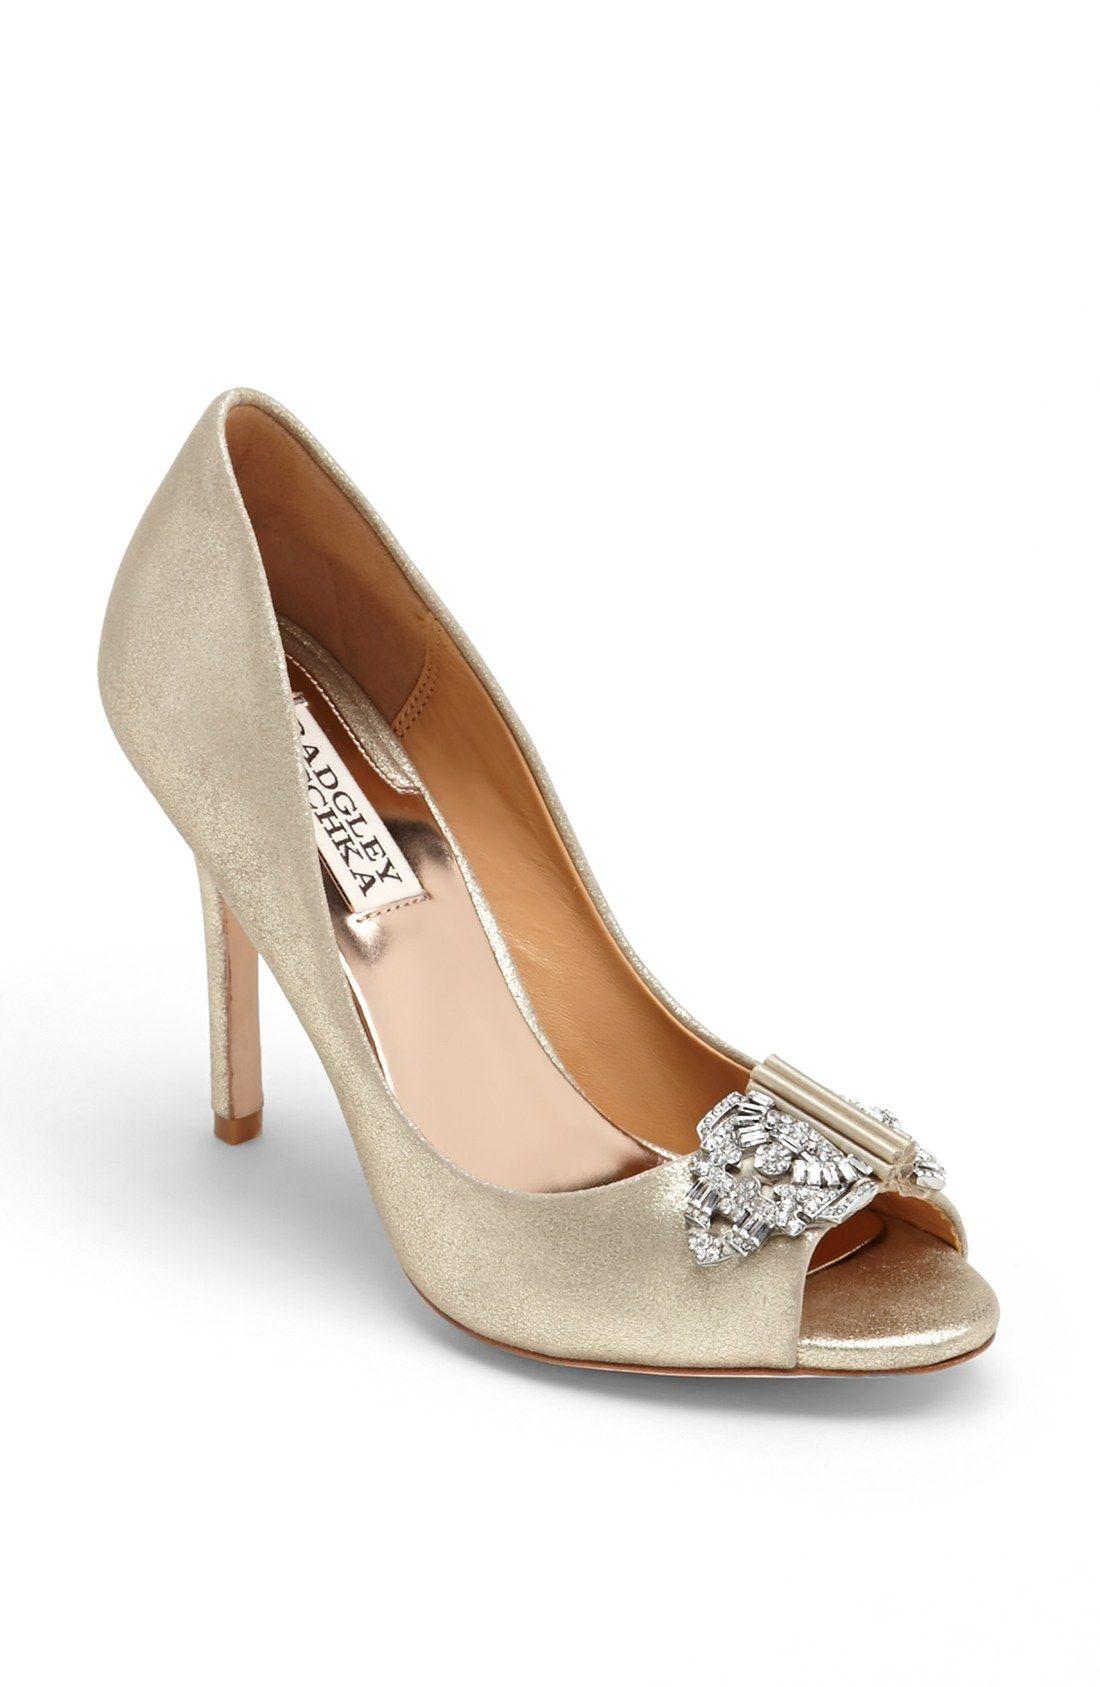 Soft gold bridal shoes from Badgley Mischka Badgley Mischka shoes